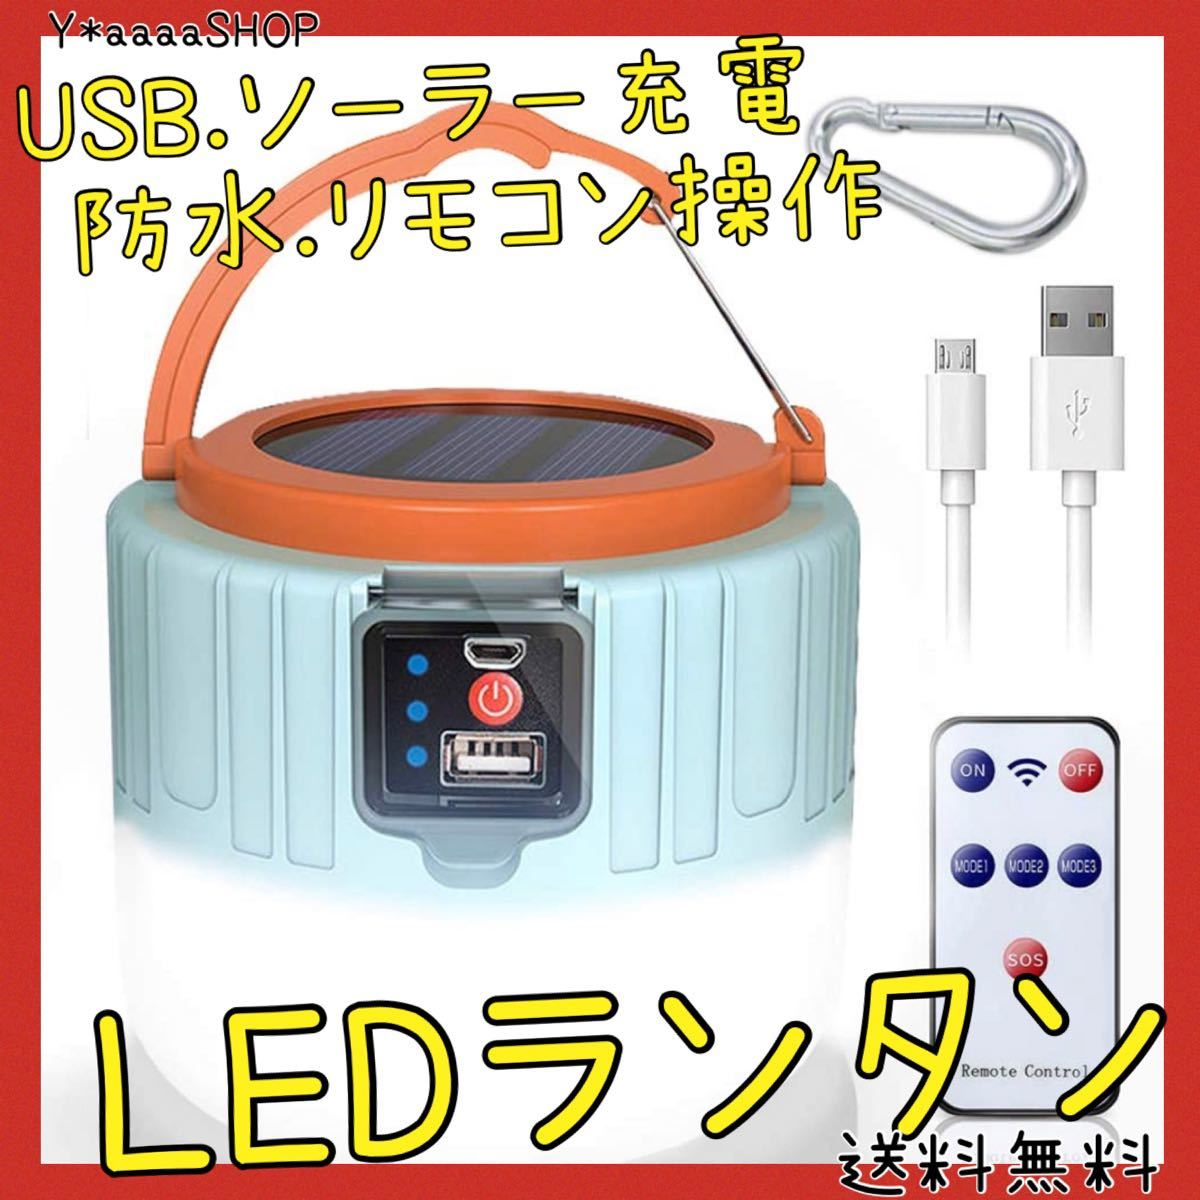 LEDランタン ランタン 3色切替 ソーラーランタン usbリモコン 小型 防水